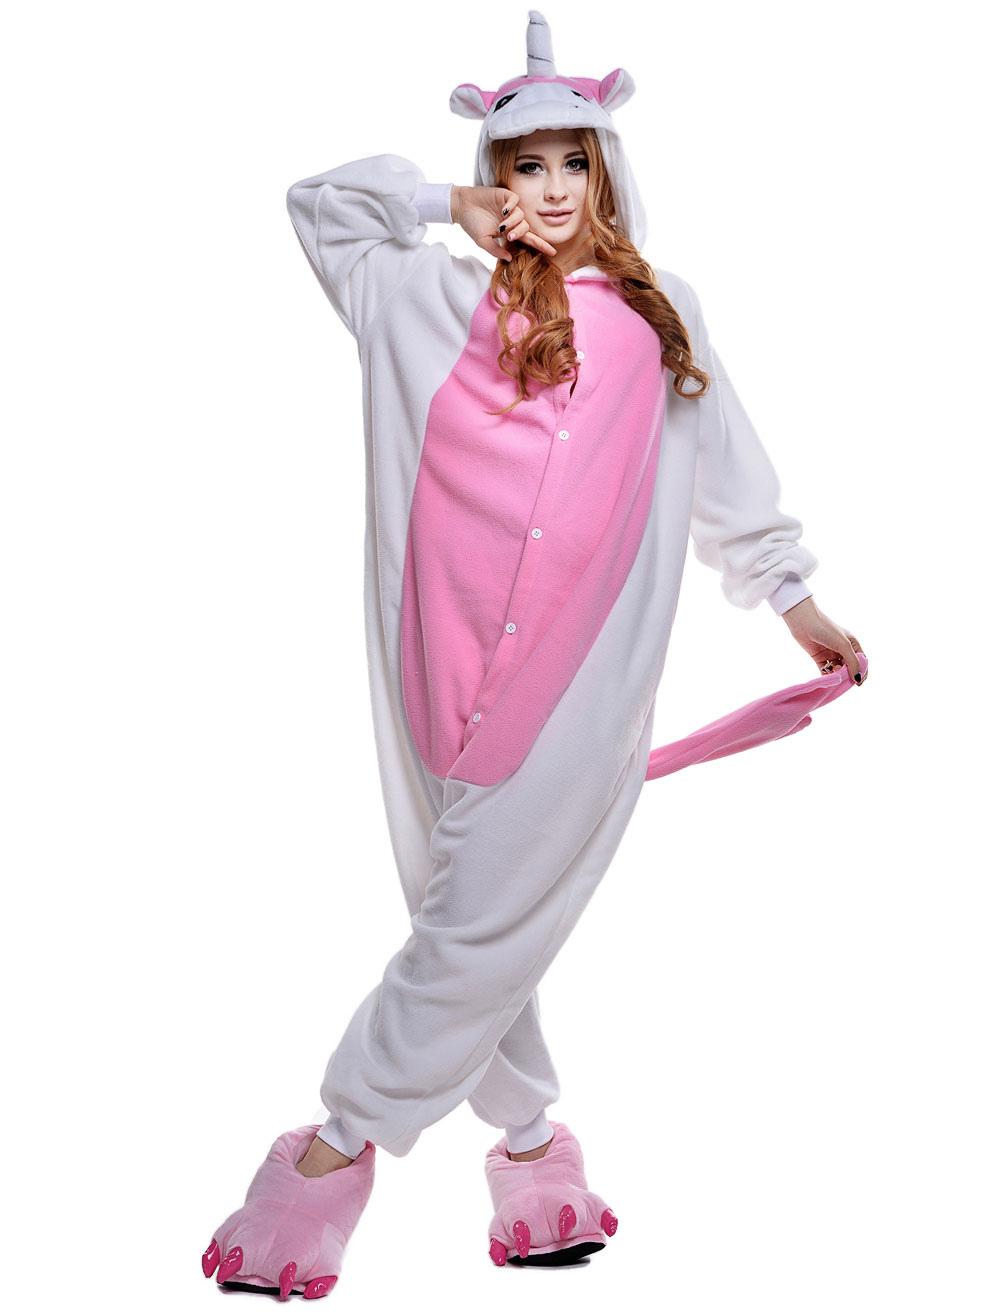 unicorno costume carnevale  Kigurumi Pigiama Licorne Unicorno Tutina Per Costume Carnevale ...